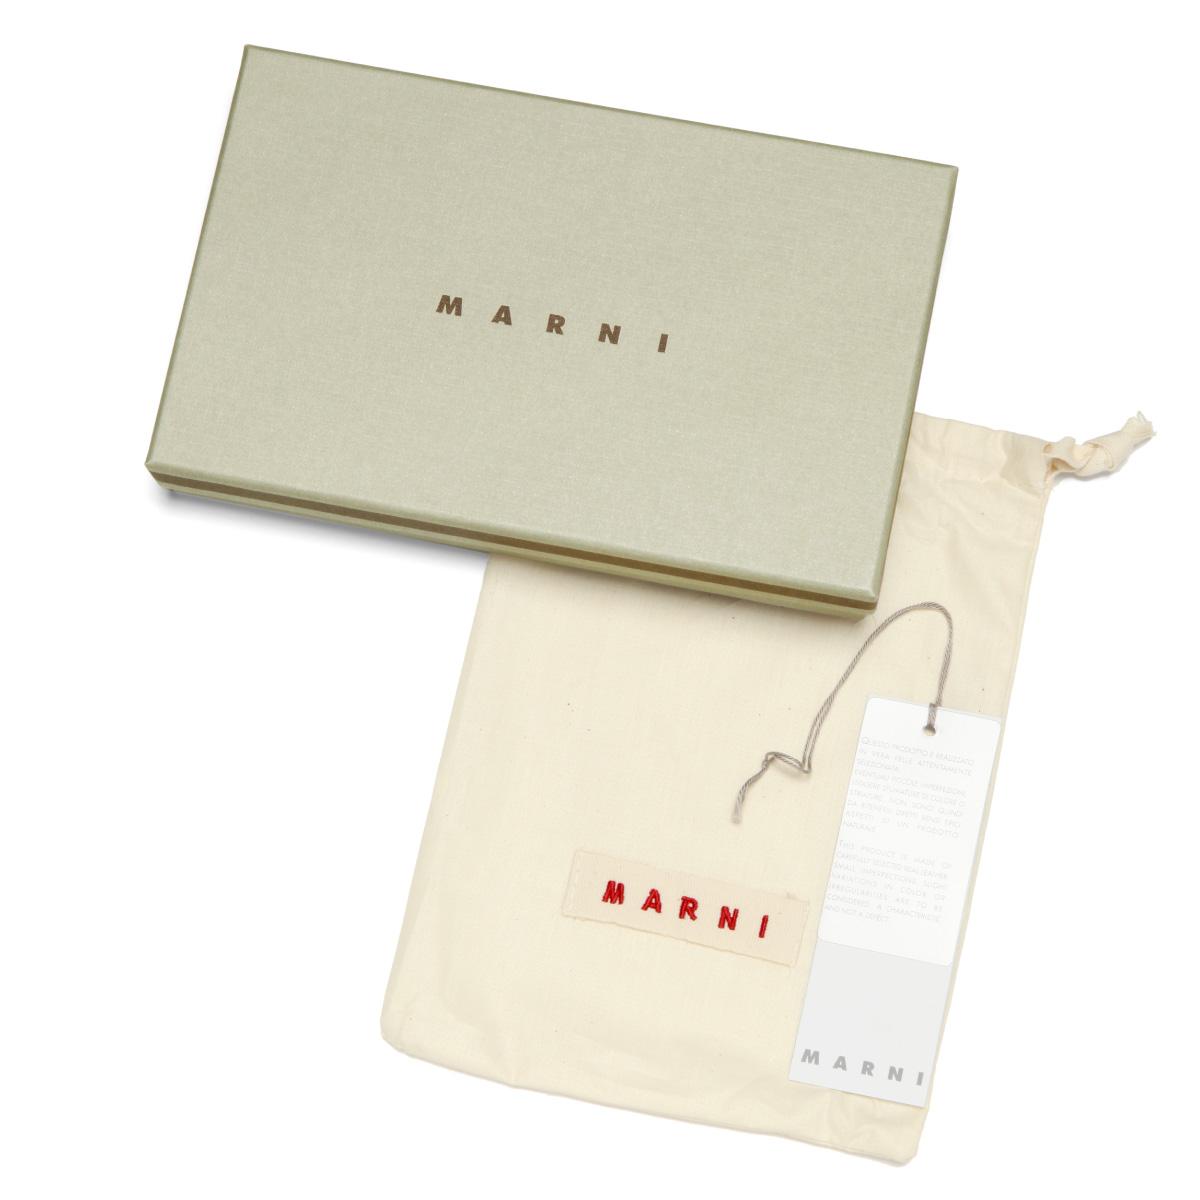 MARNI マルニ | ラウンドファスナー長財布